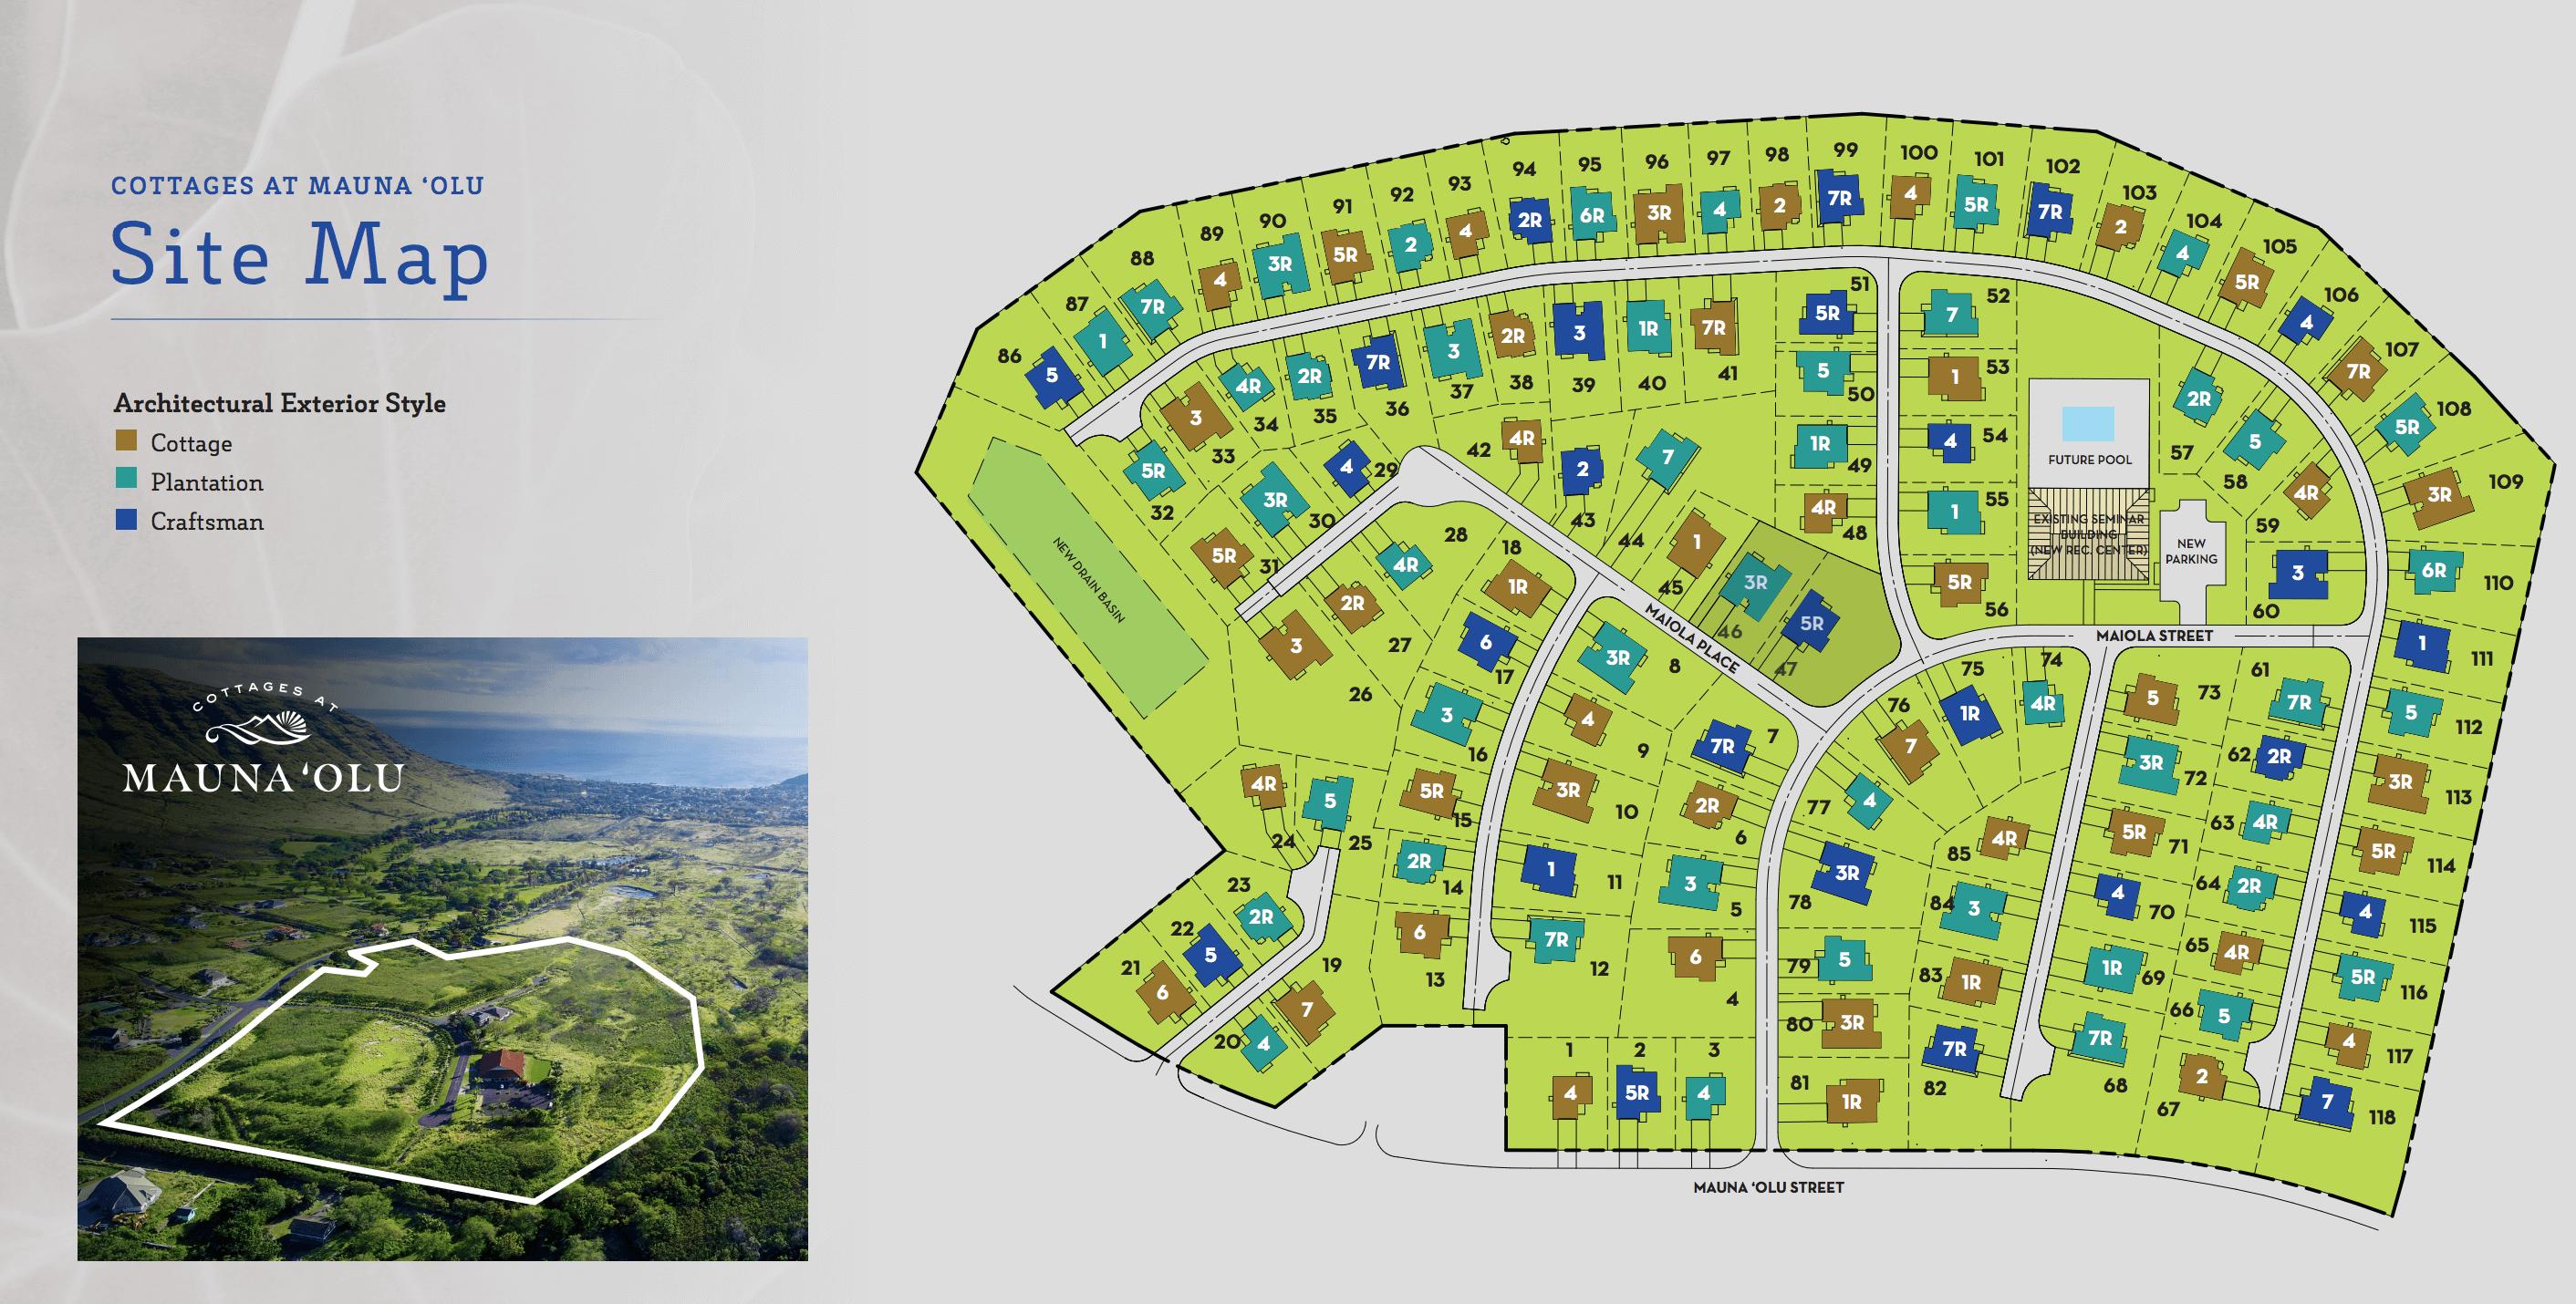 Cottage at Mauna'olu Site Map